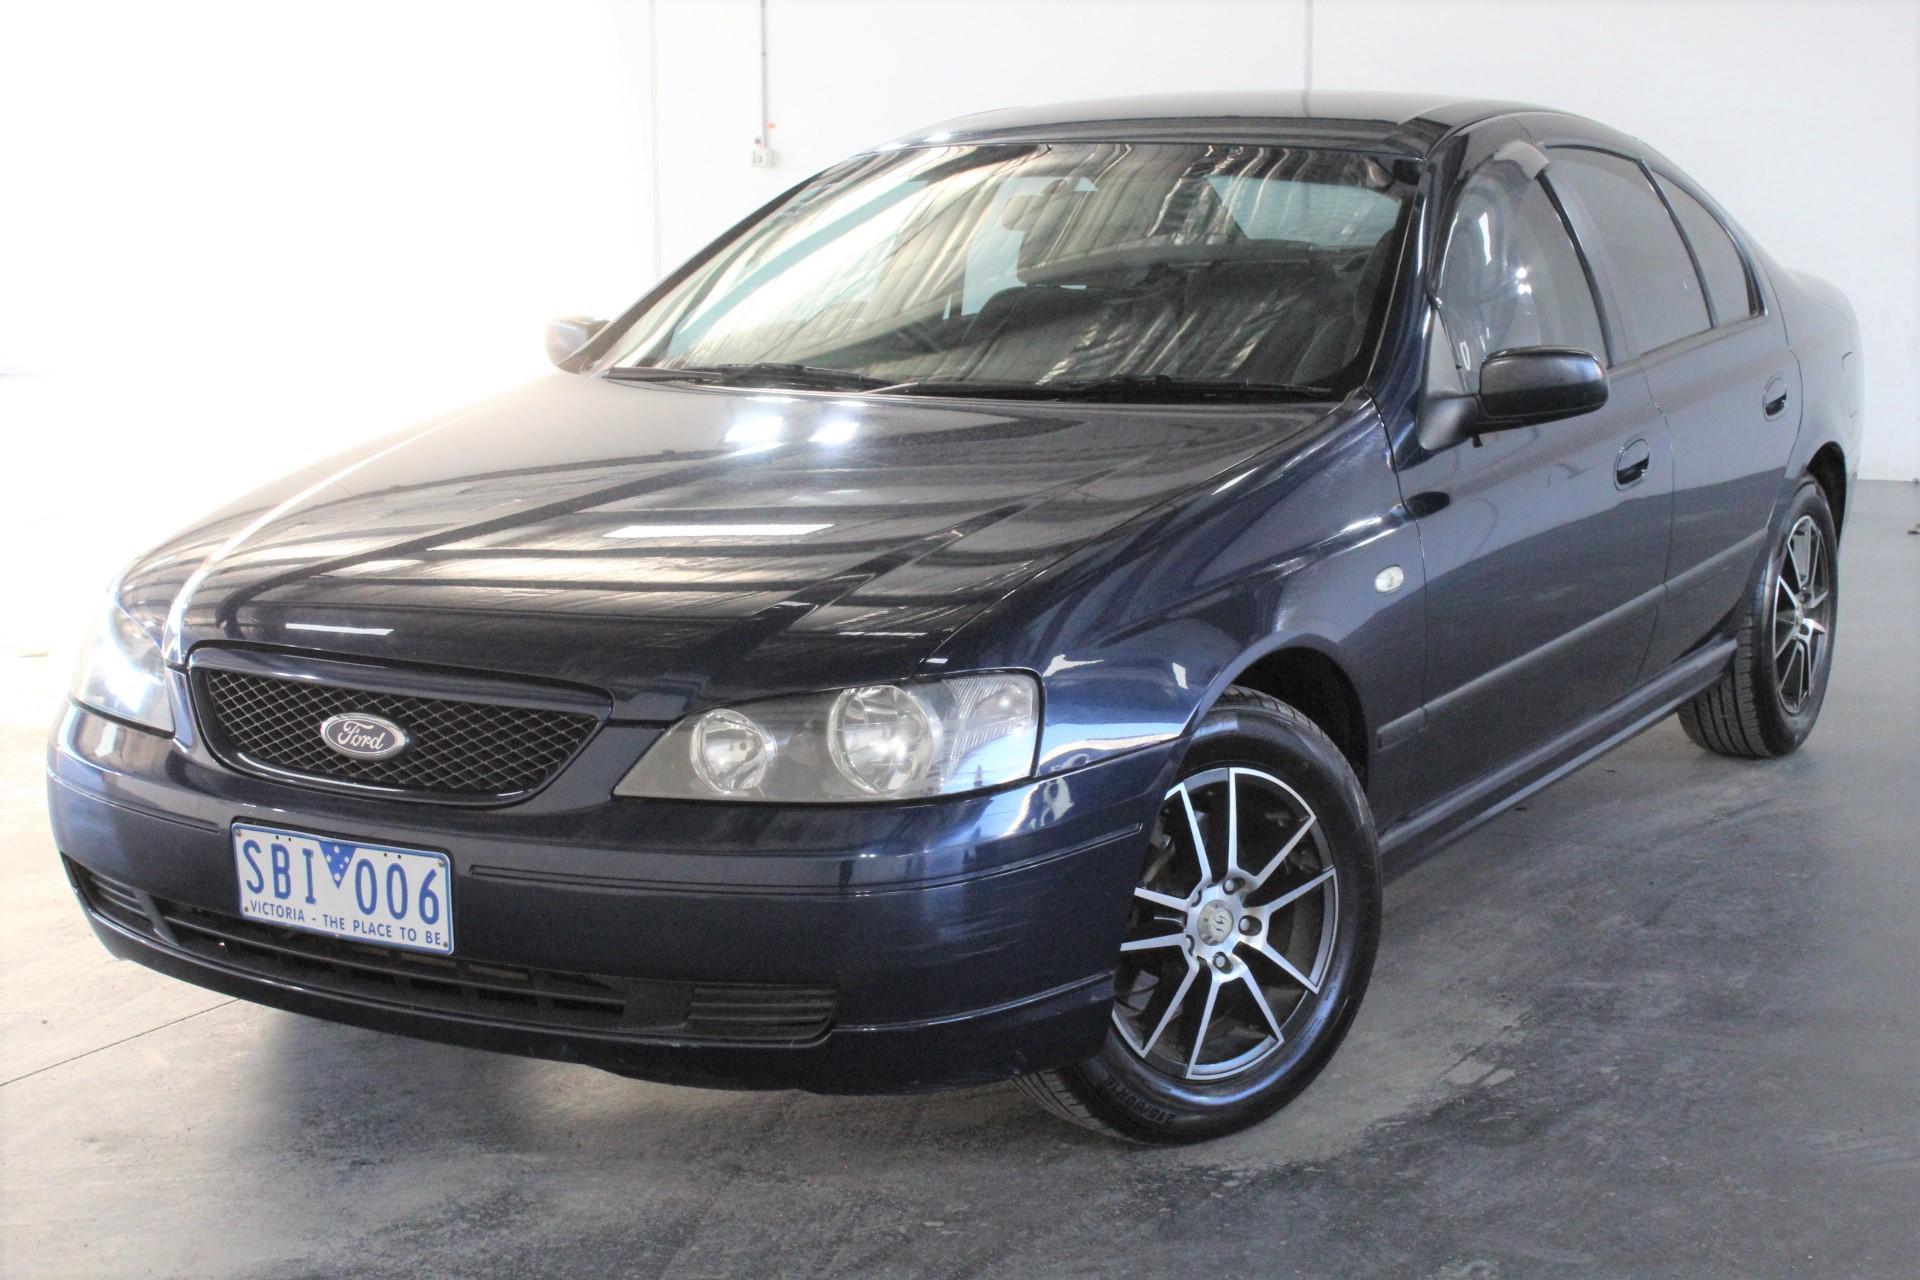 2002 Ford Falcon XT BA Automatic Sedan